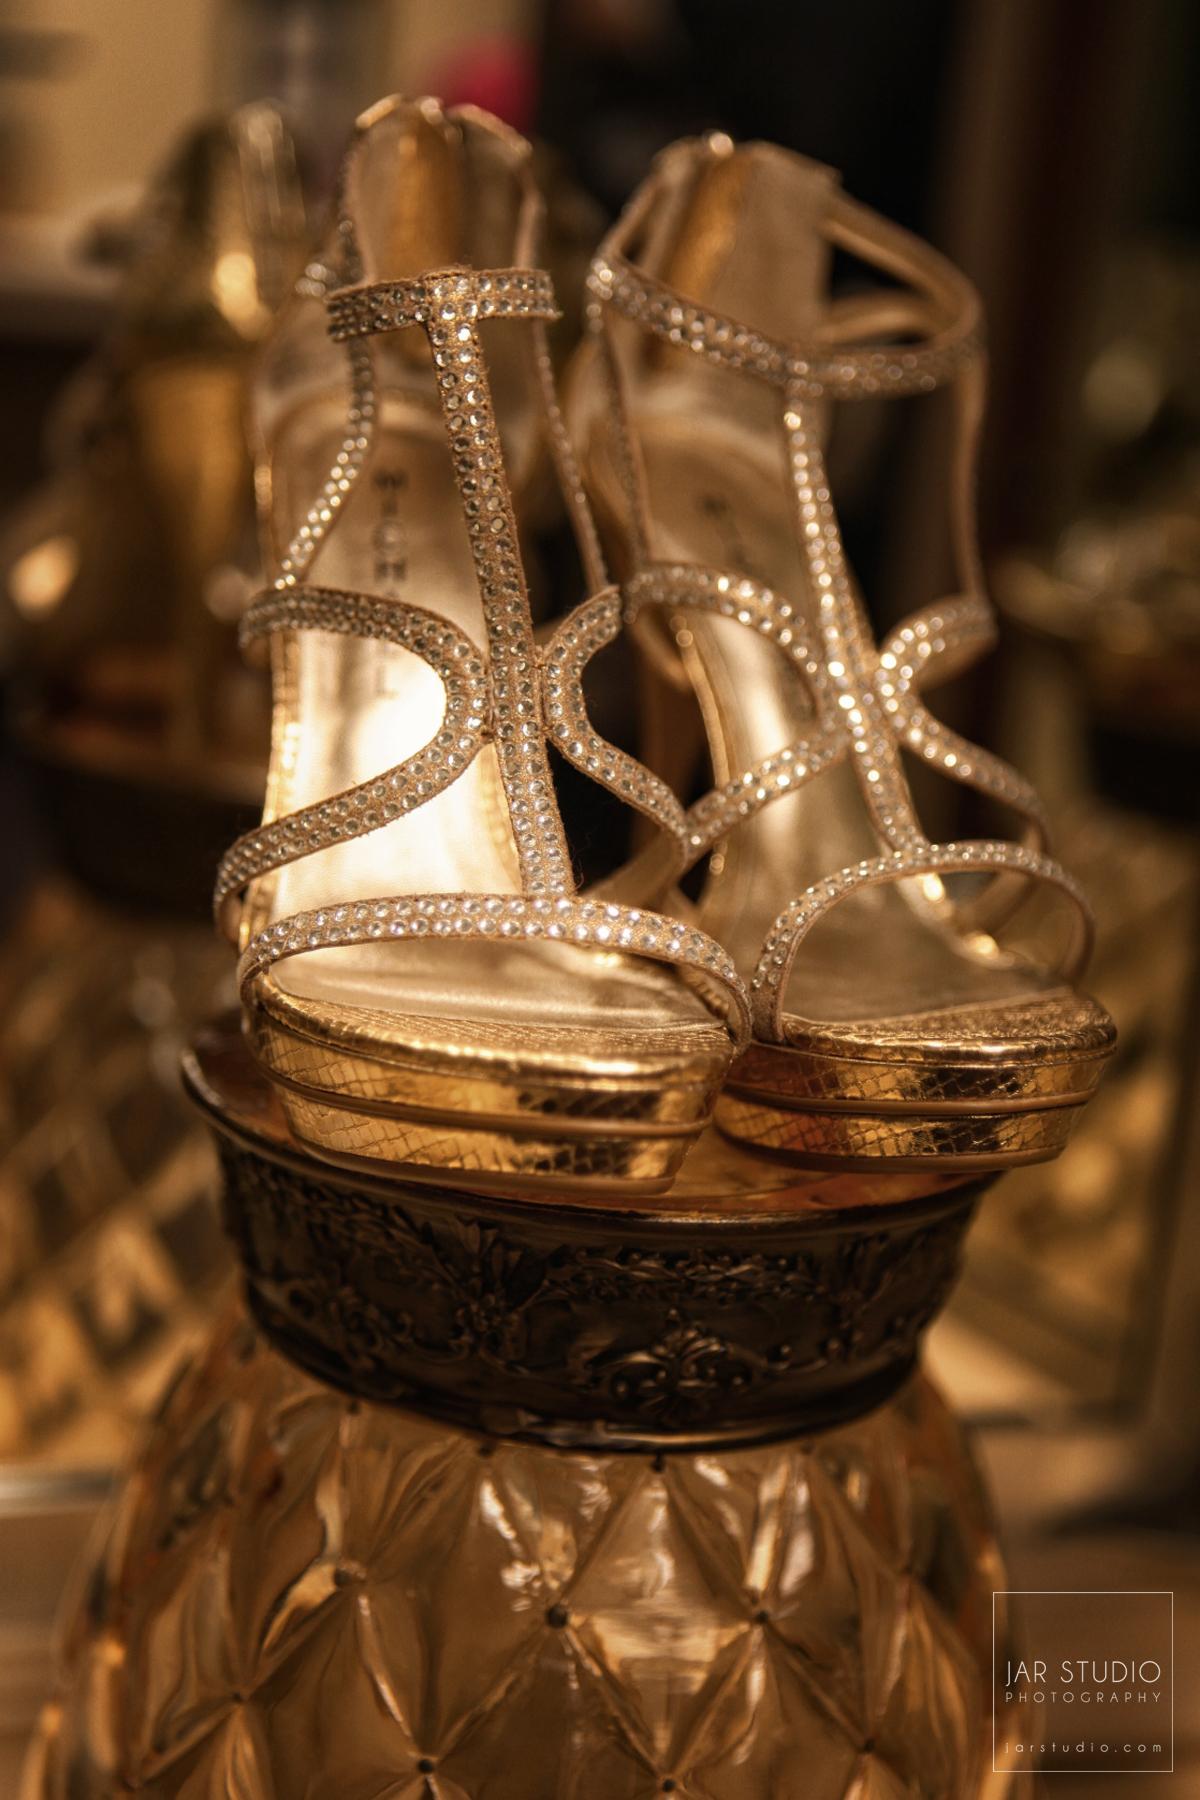 02-wedding-shoes-gorgeous-orlando-photographer.JPG